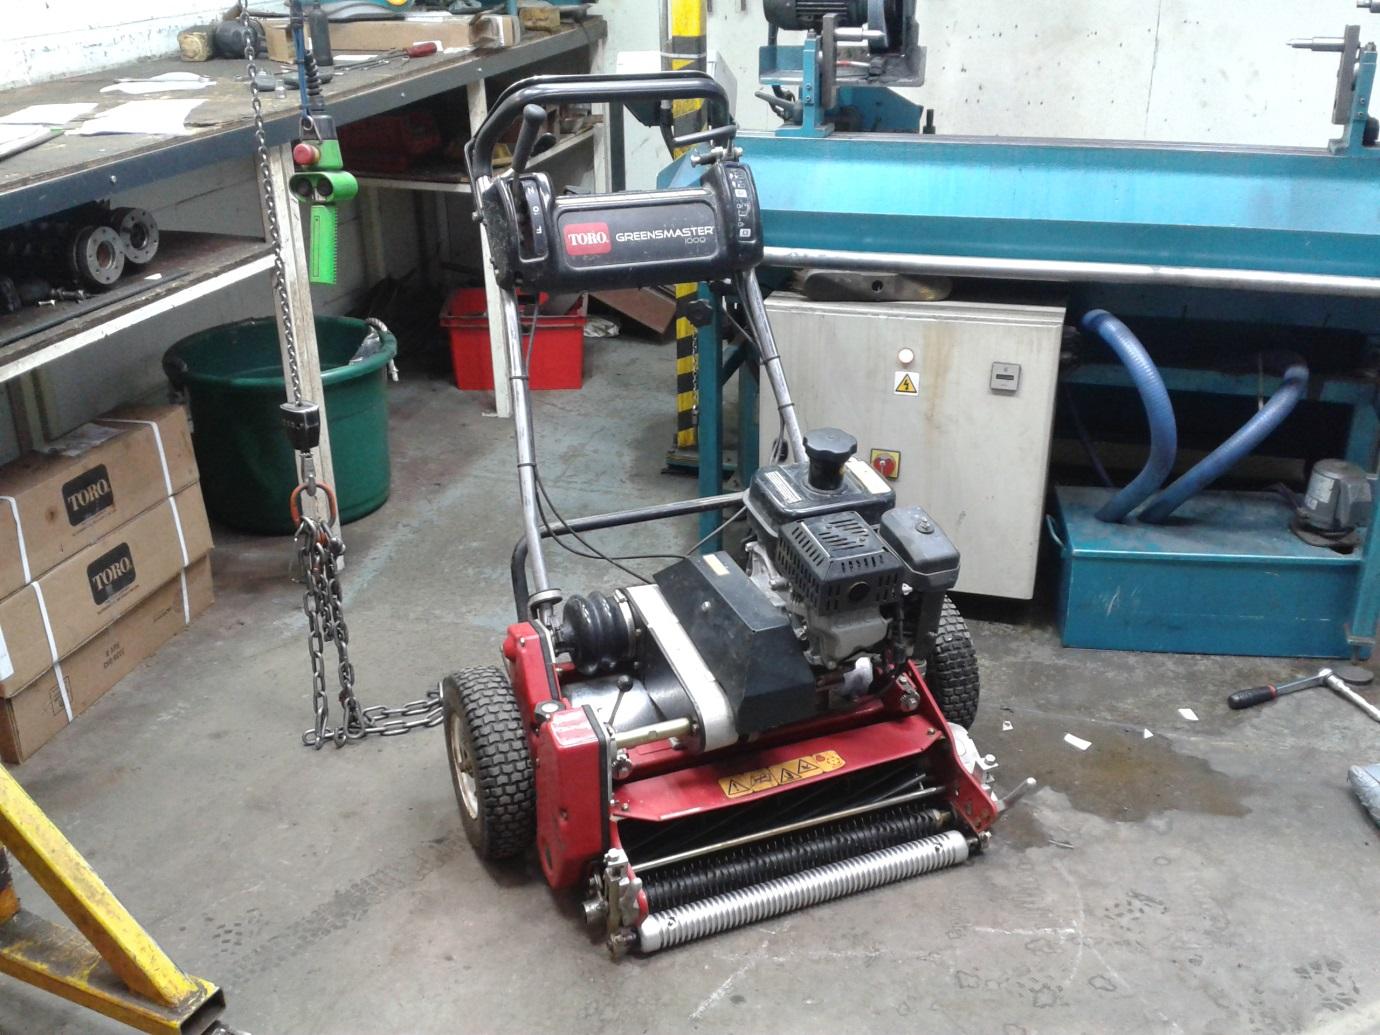 Keeping the mowers sharp - St Andrews Links Blog